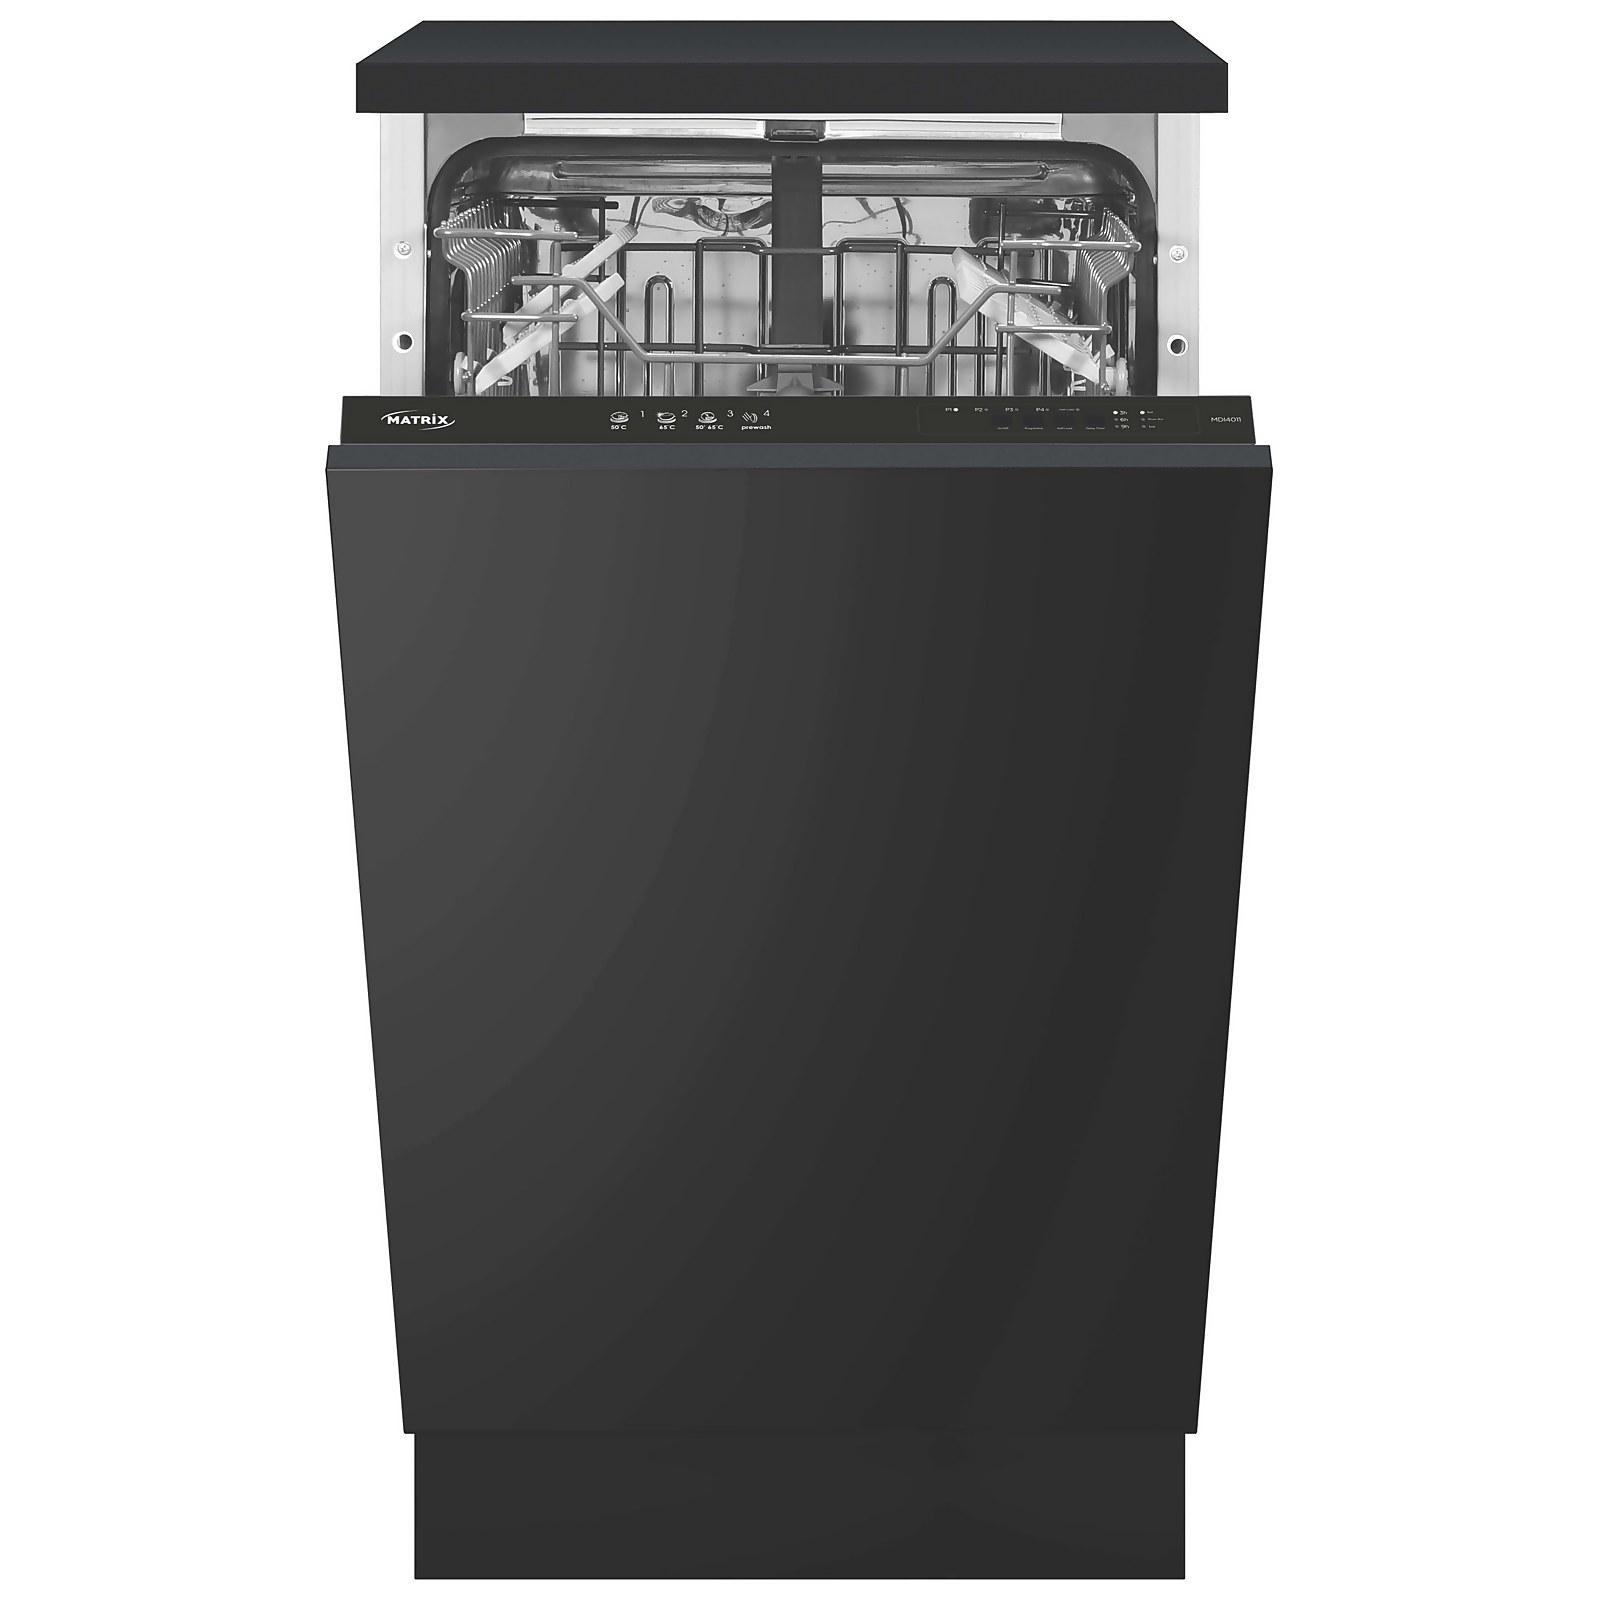 Matrix MDI4011 Integrated Slimline Dishwasher - 45cm